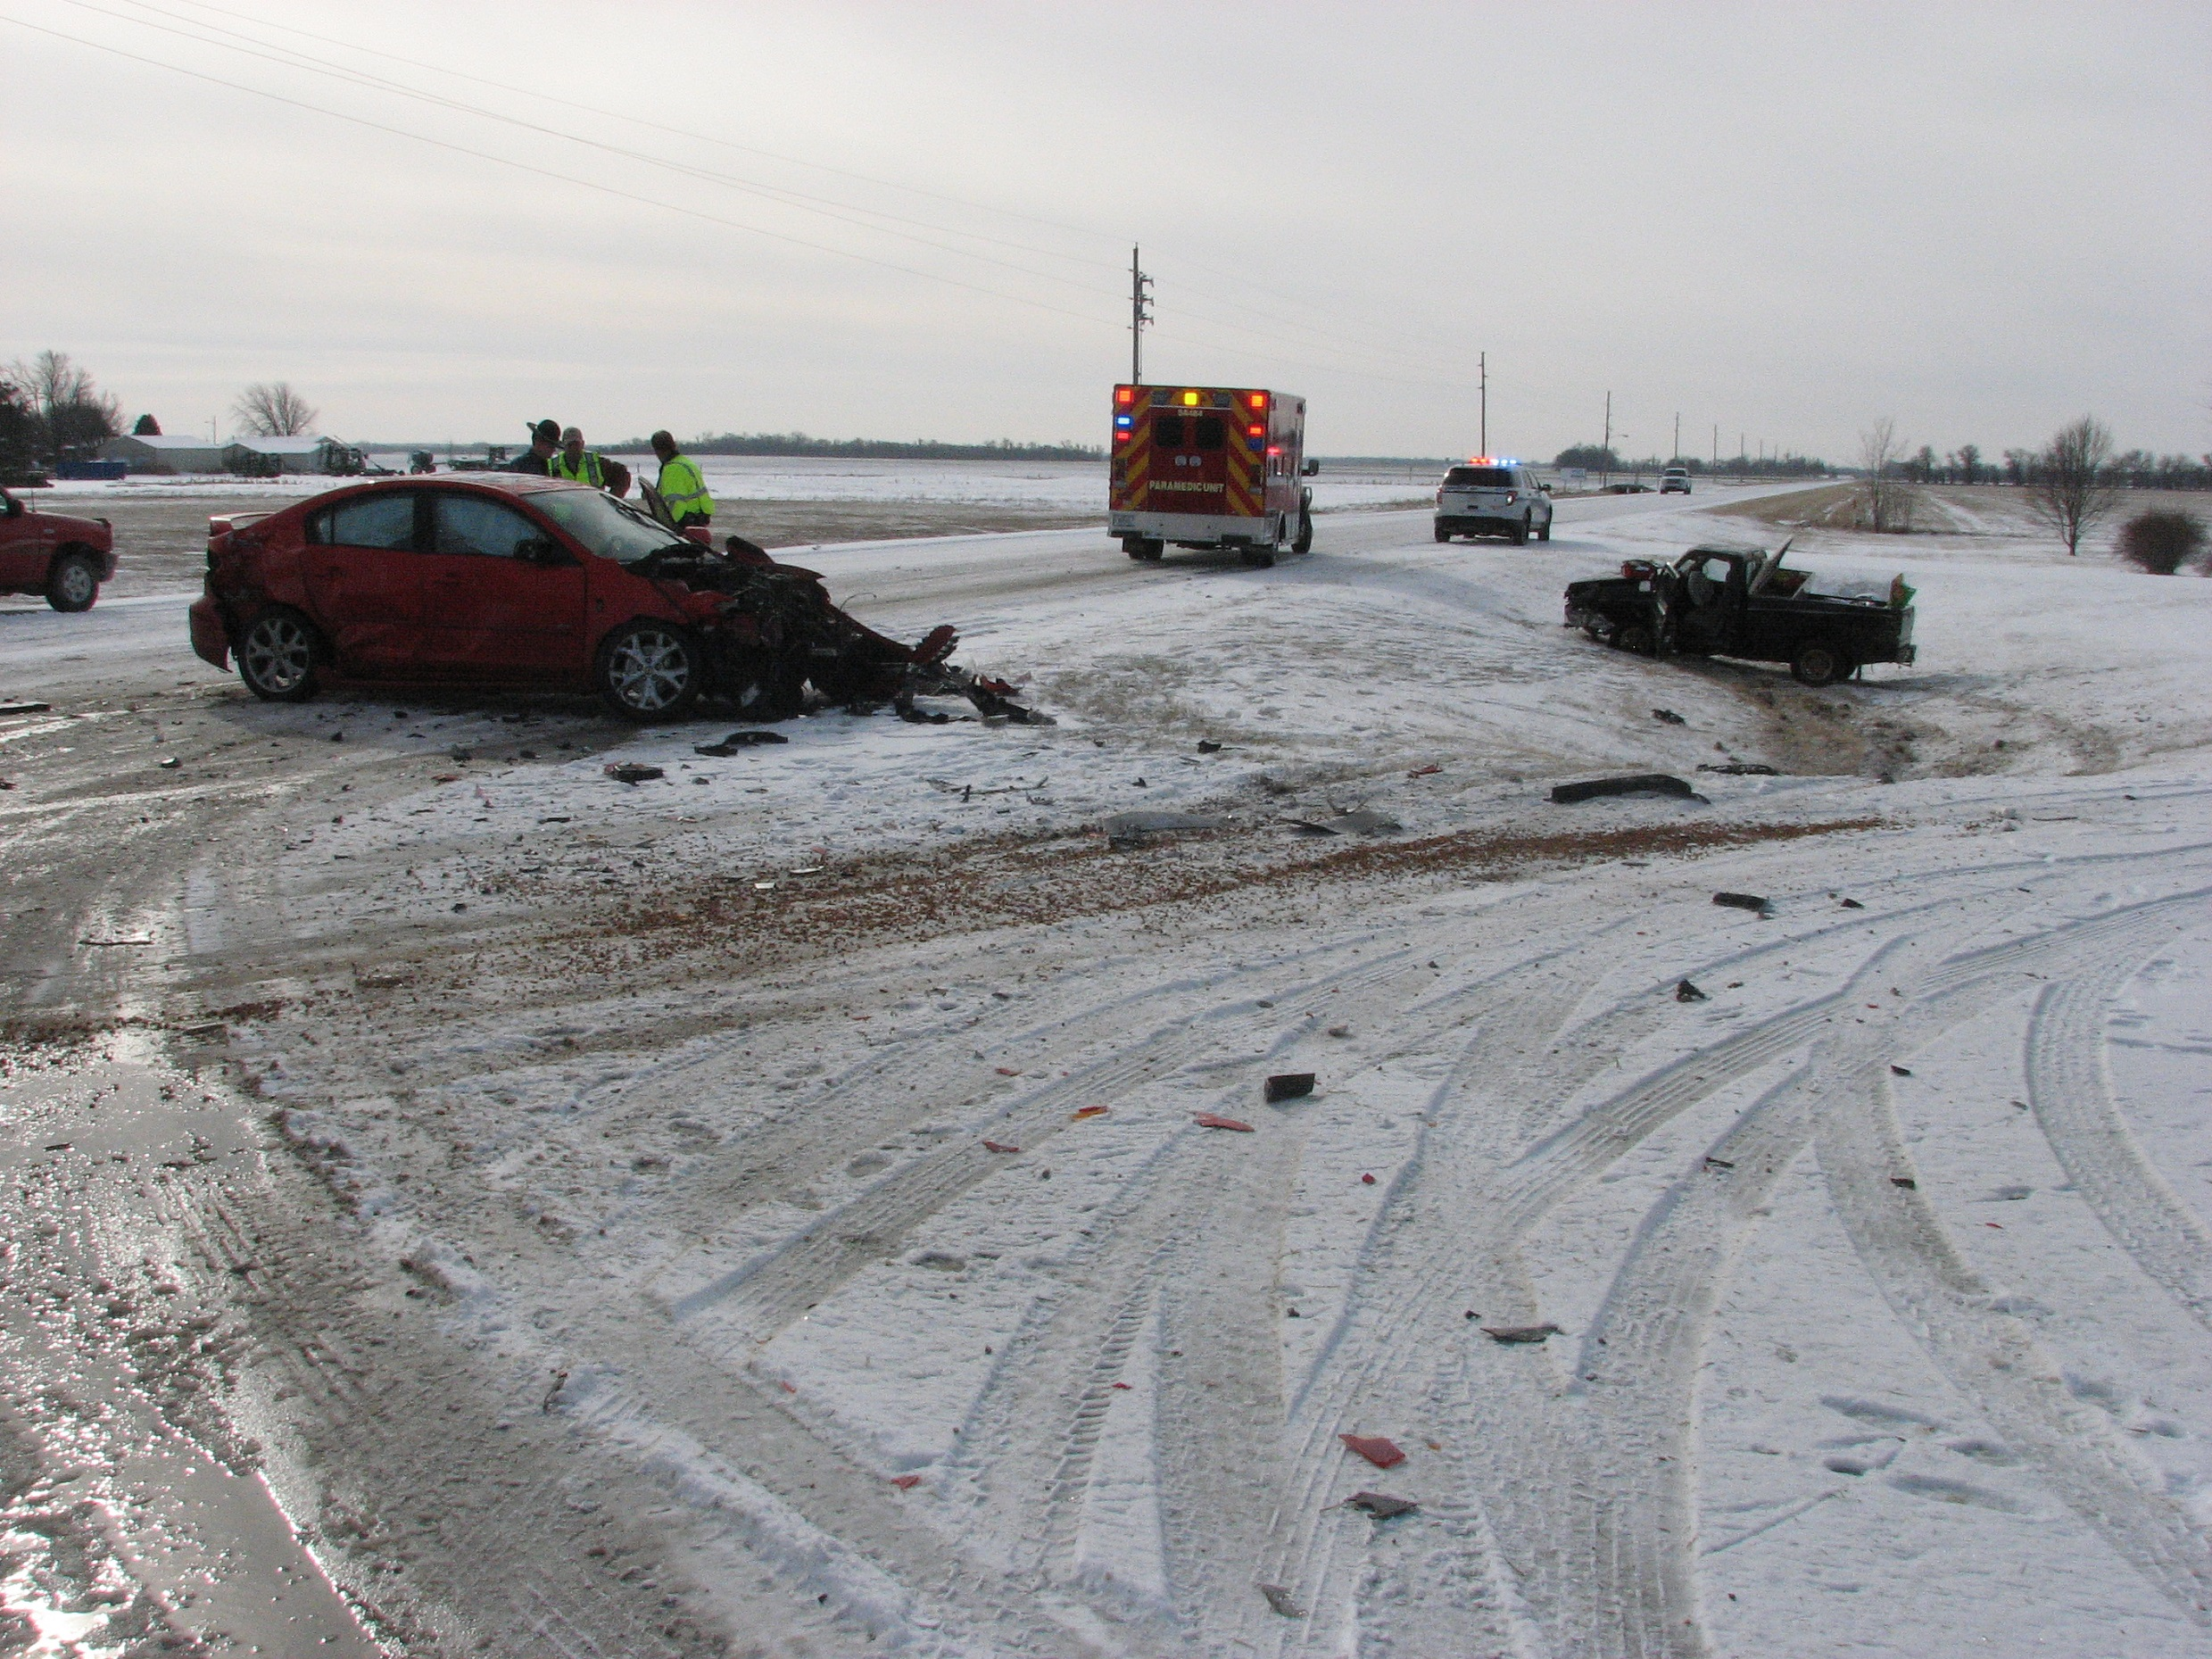 Icy Crash